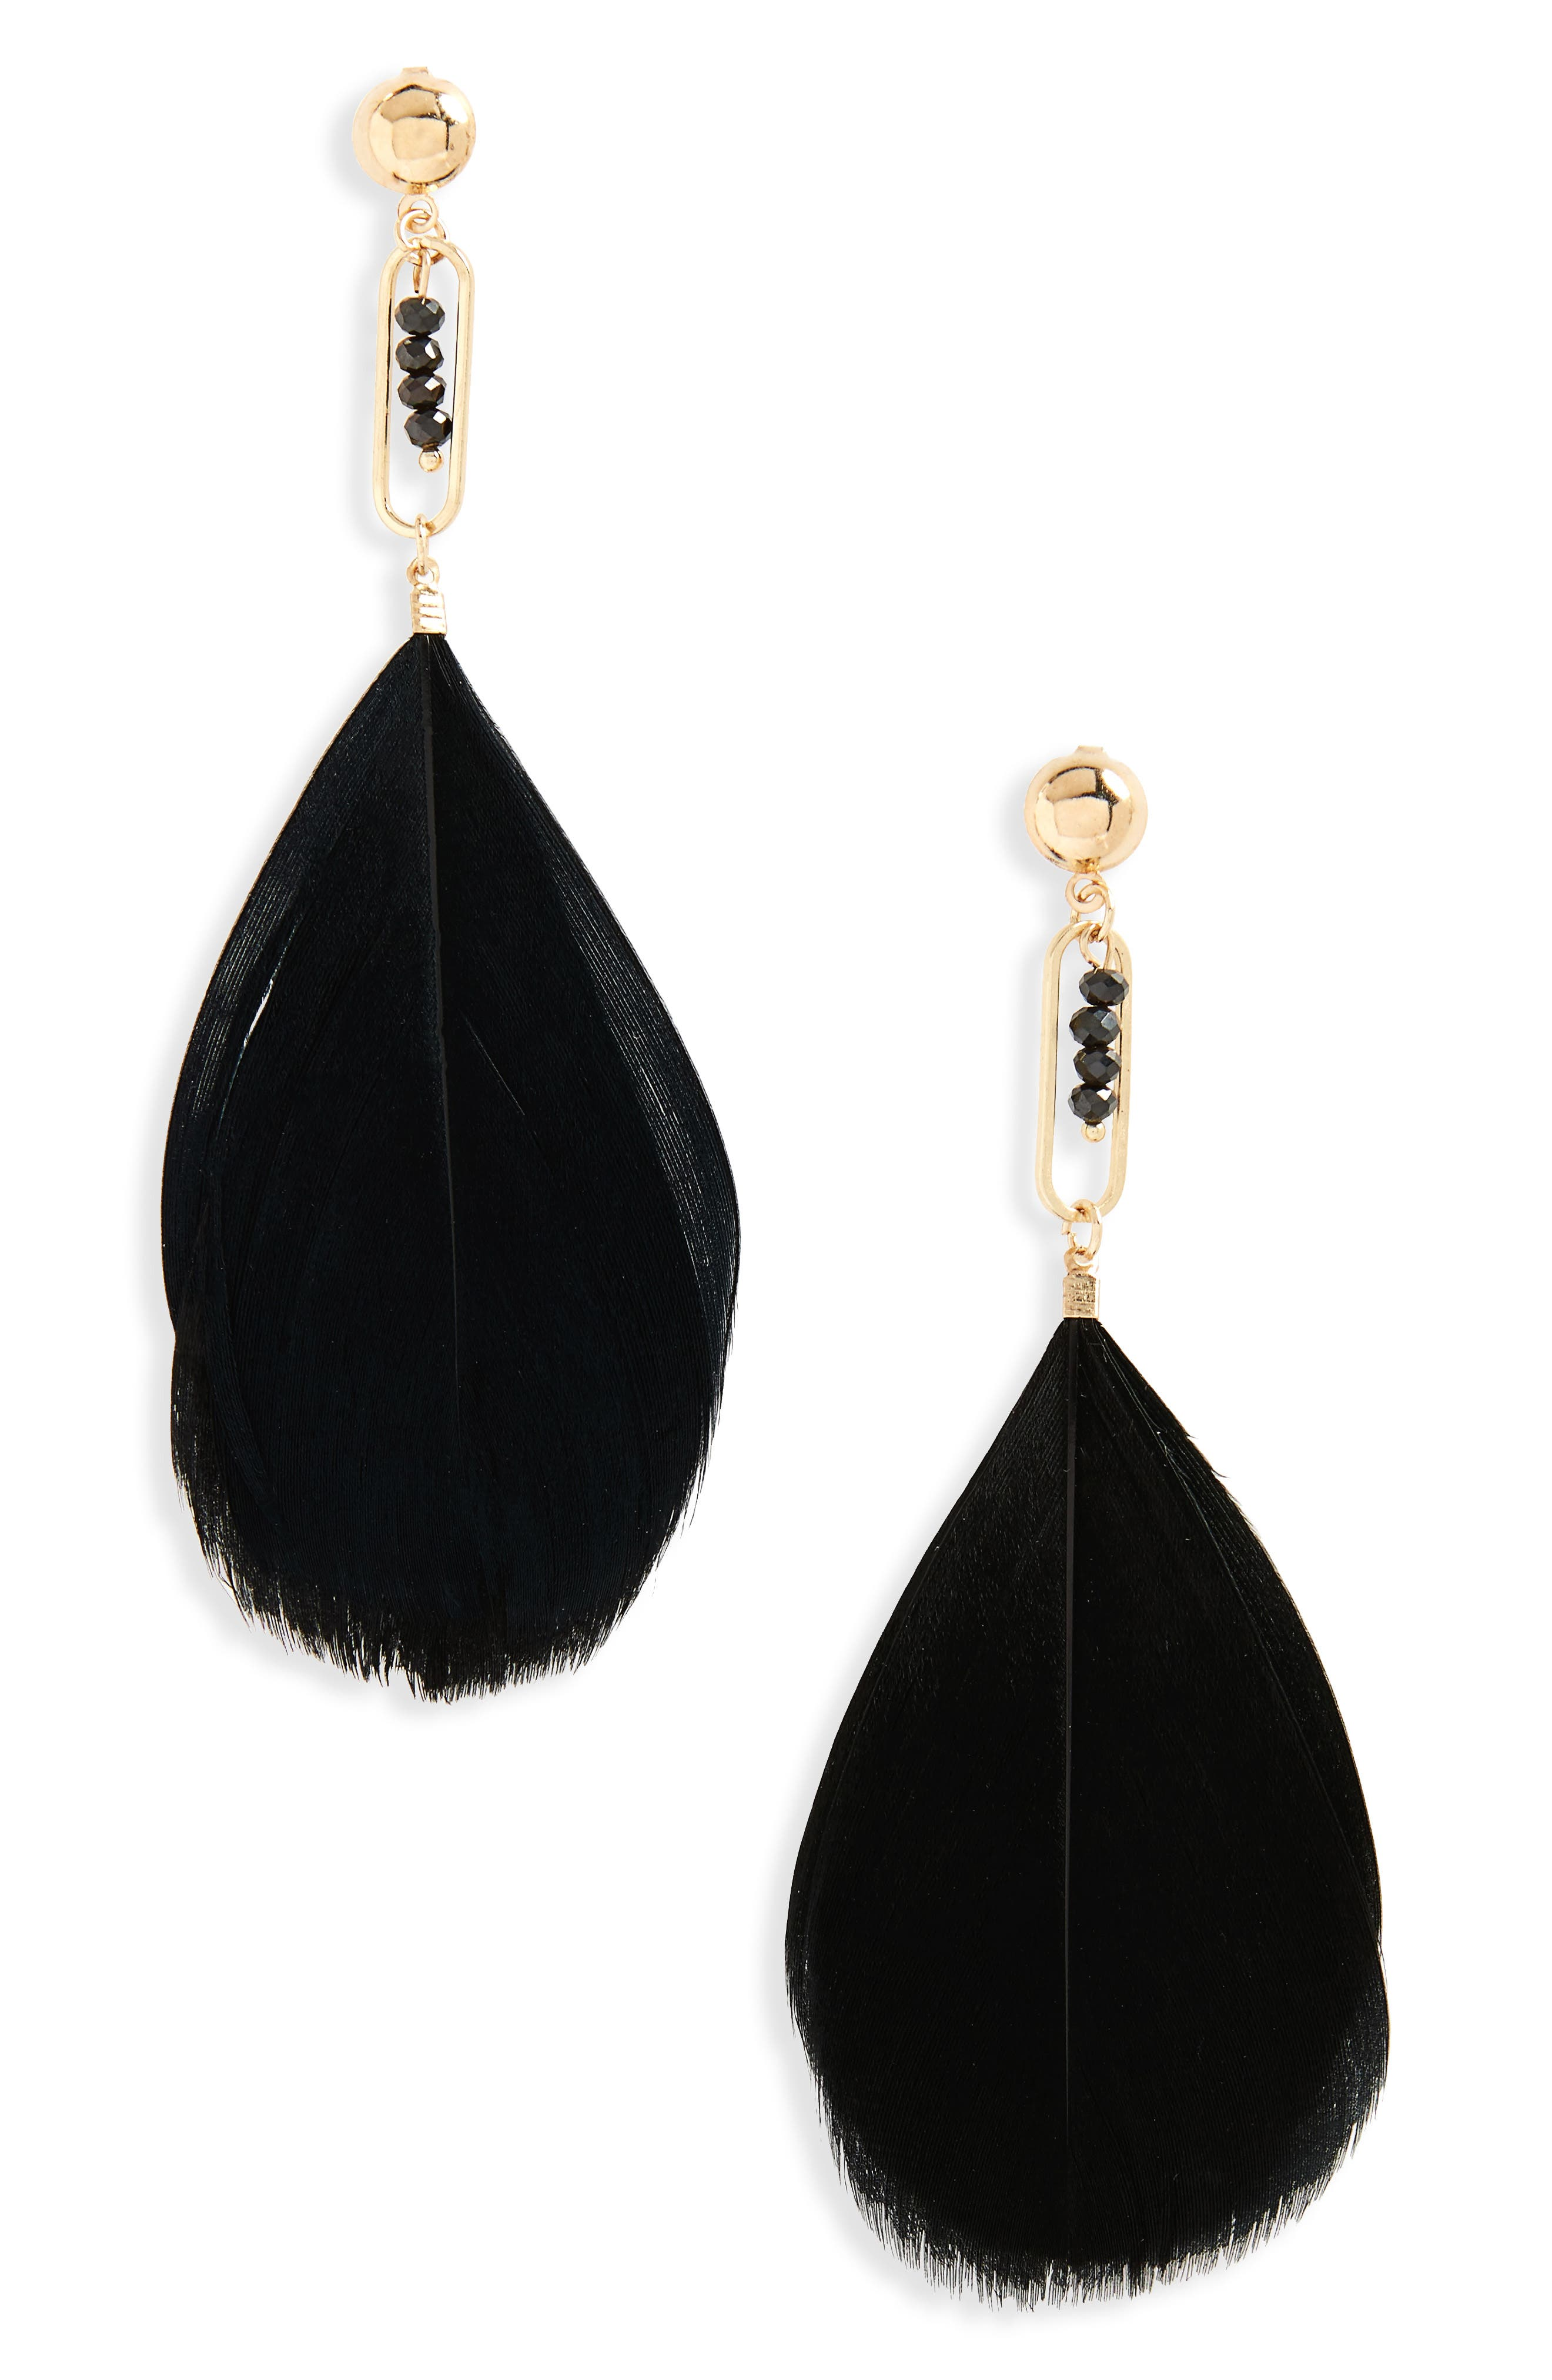 Bead & Feather Drop Earrings,                             Main thumbnail 1, color,                             001